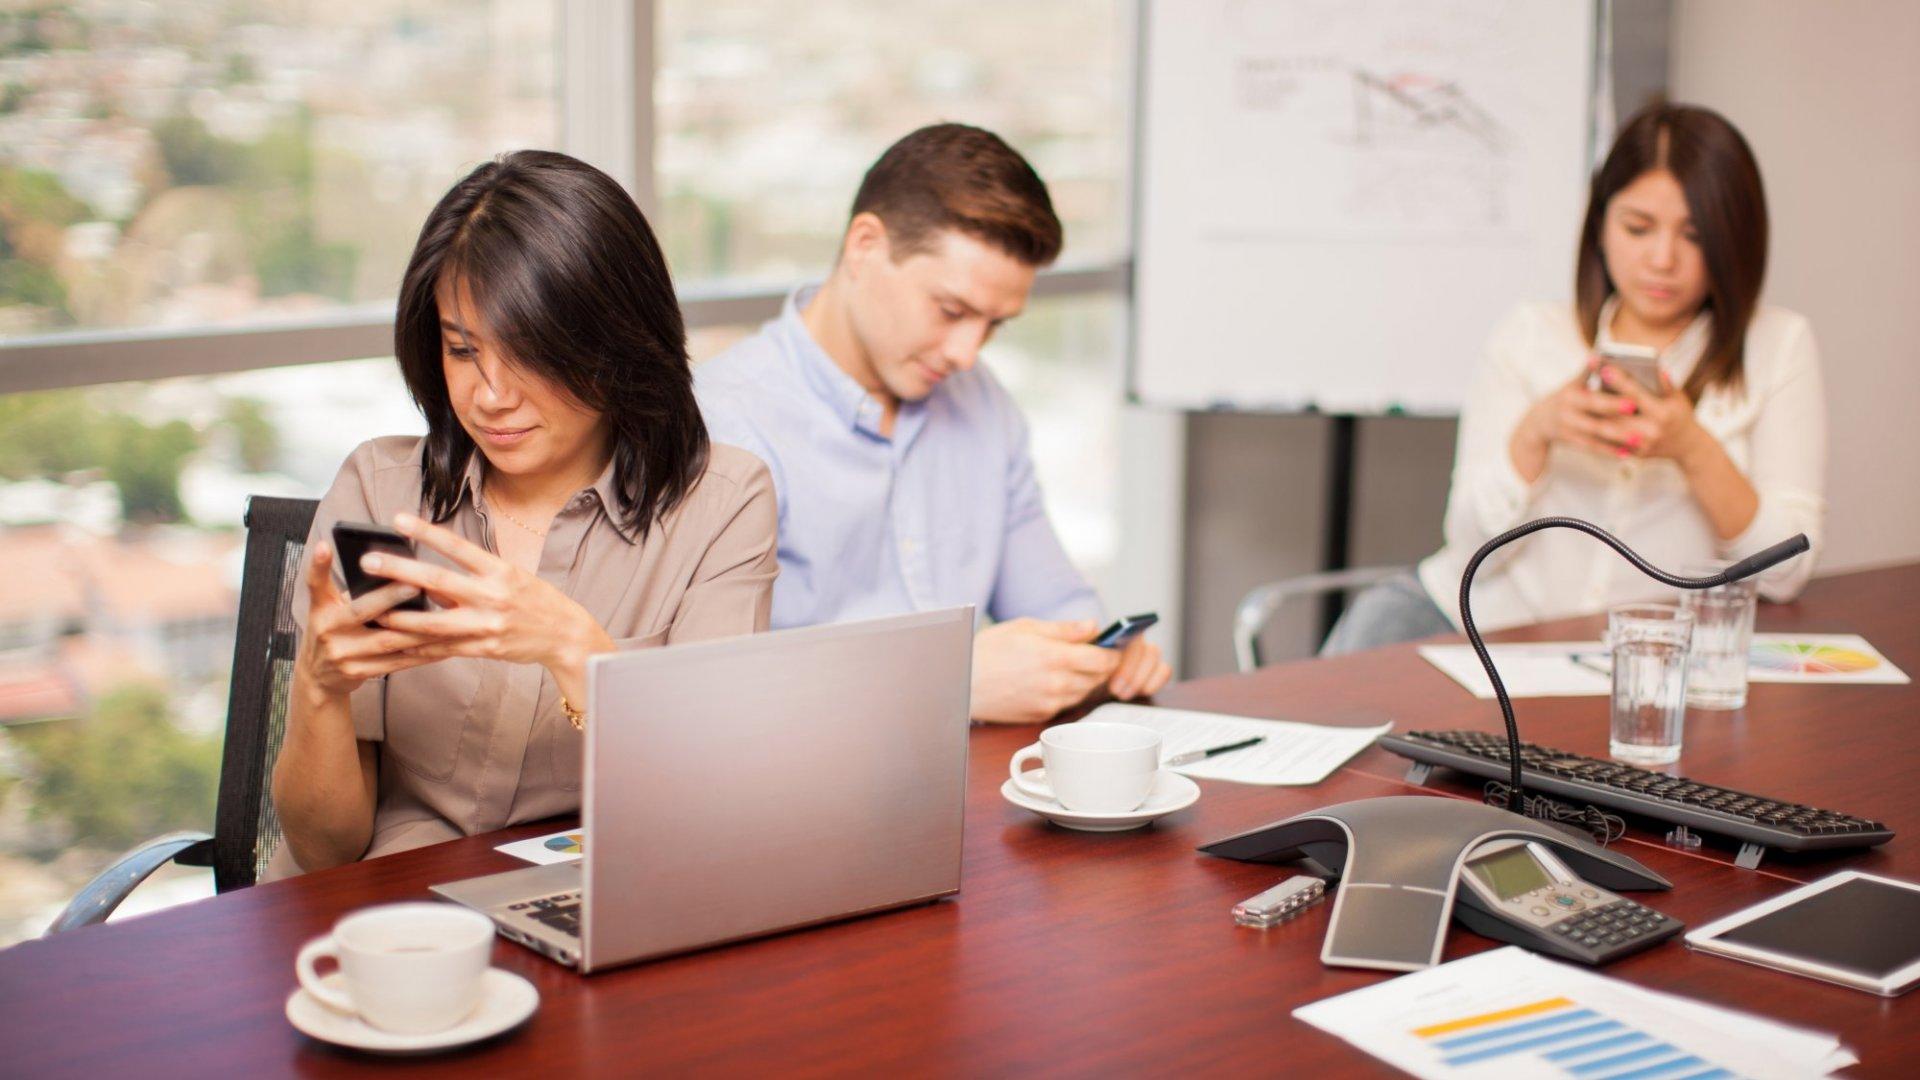 Hacking Your Board - Curbing Bad Director Behavior